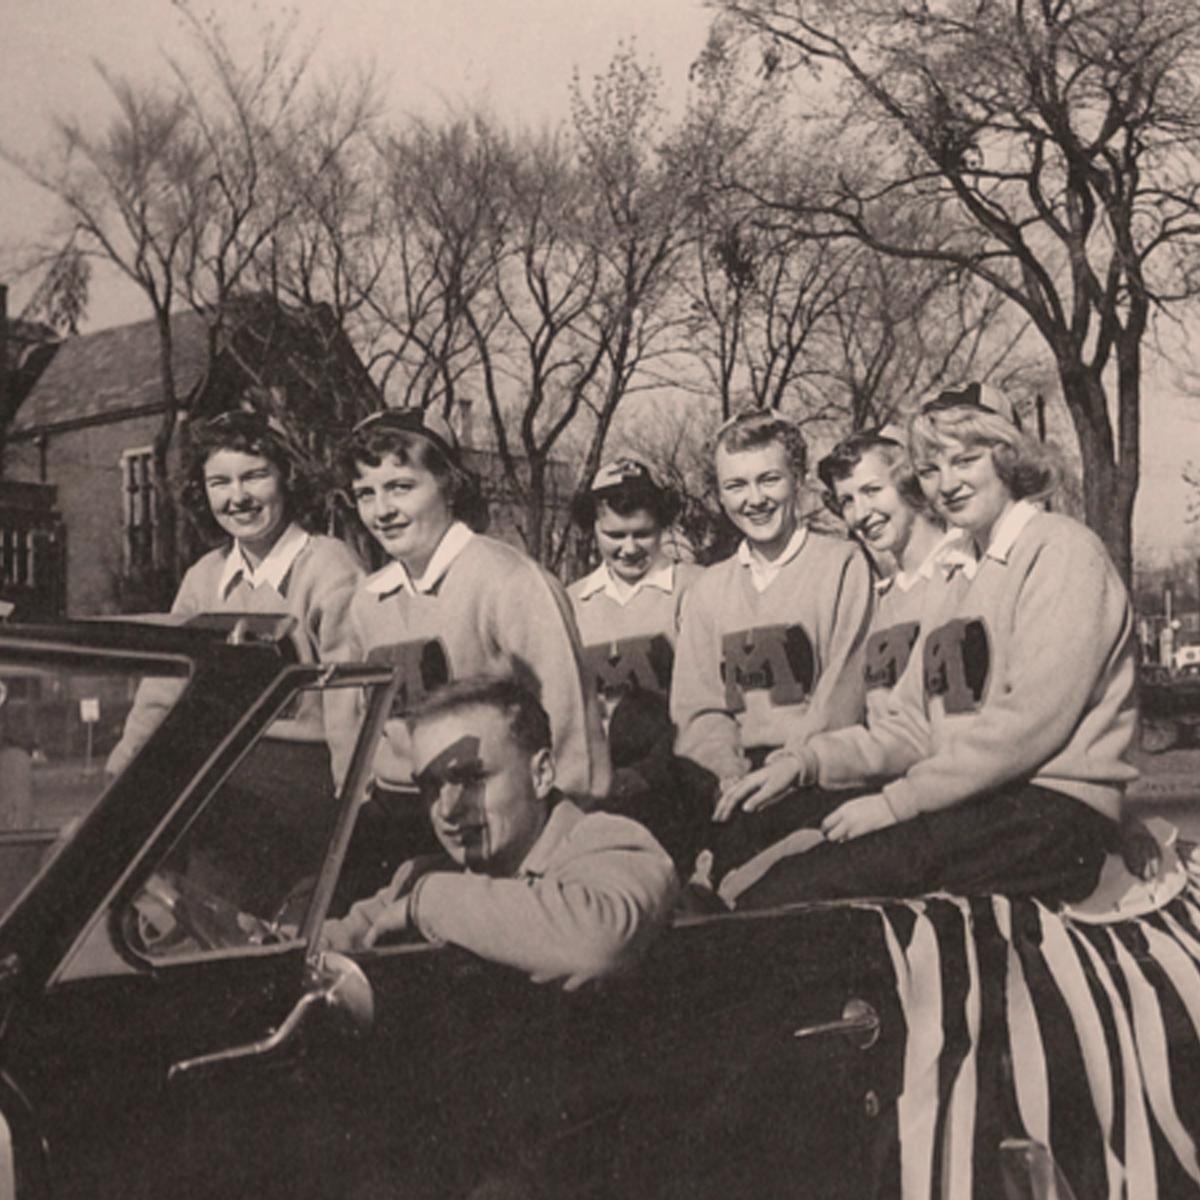 UMD Homecoming 1952